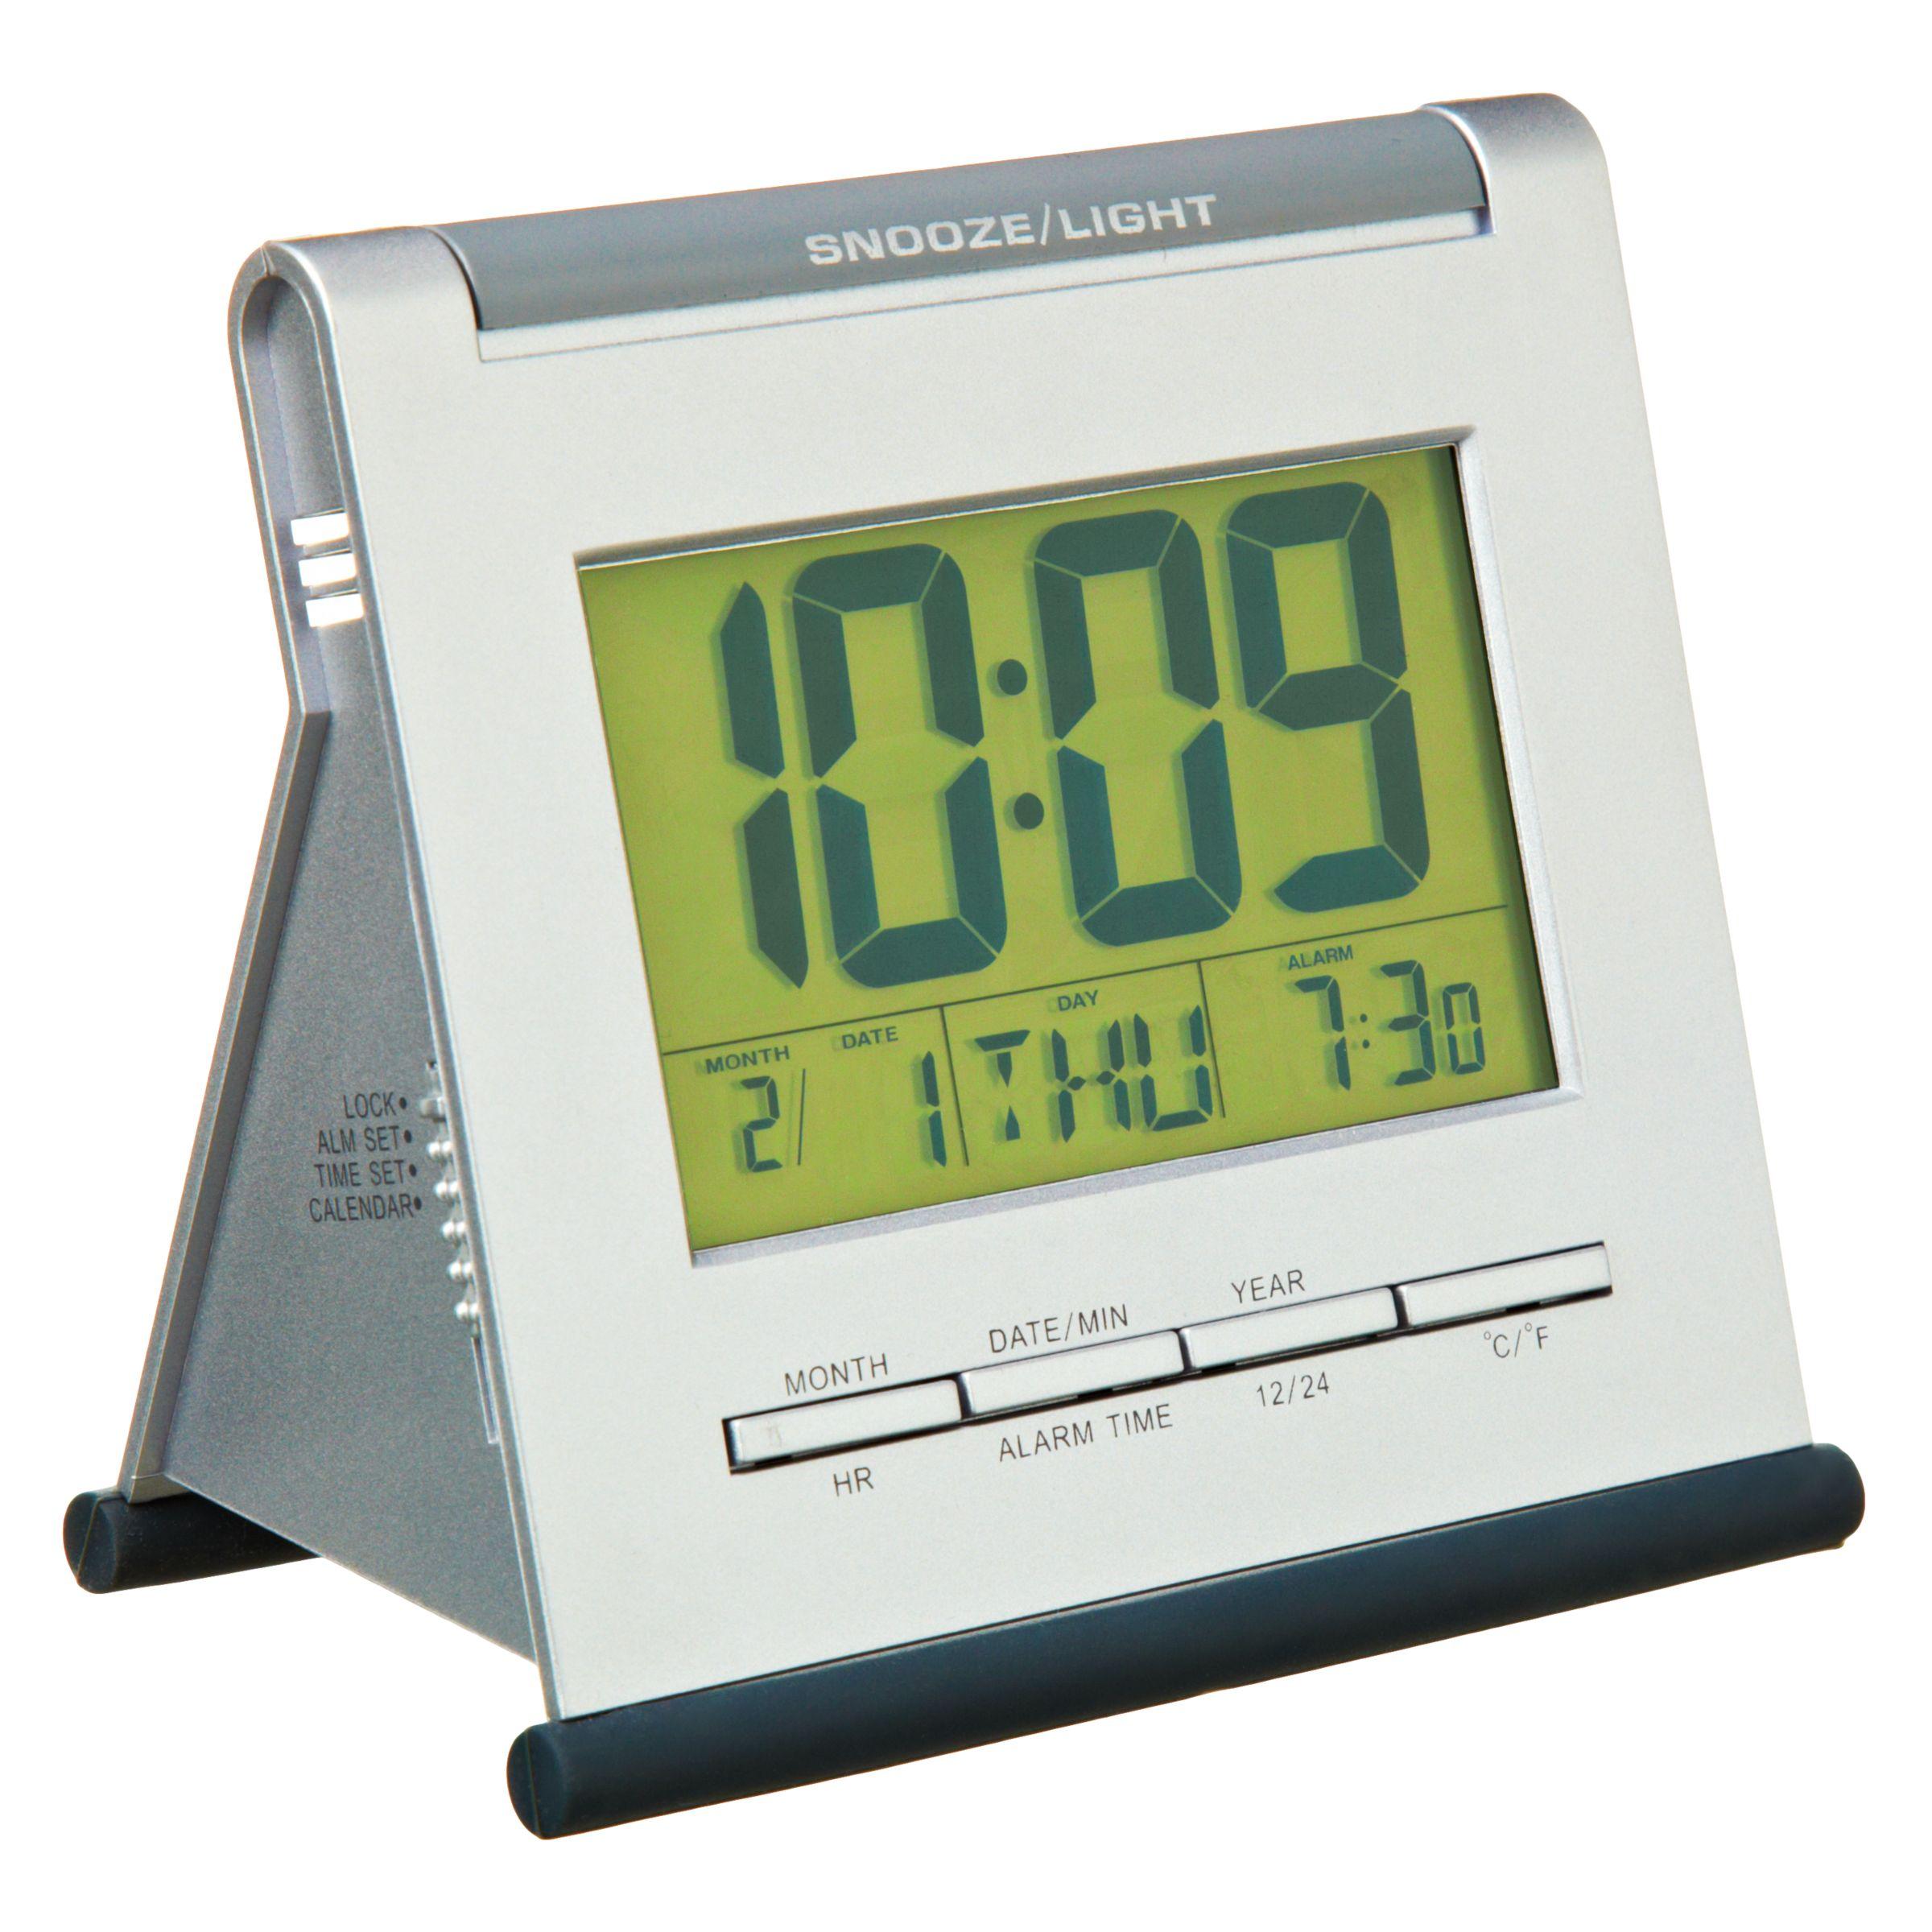 Acctim Acctim Apex Smartlite® LCD Alarm Clock, Silver